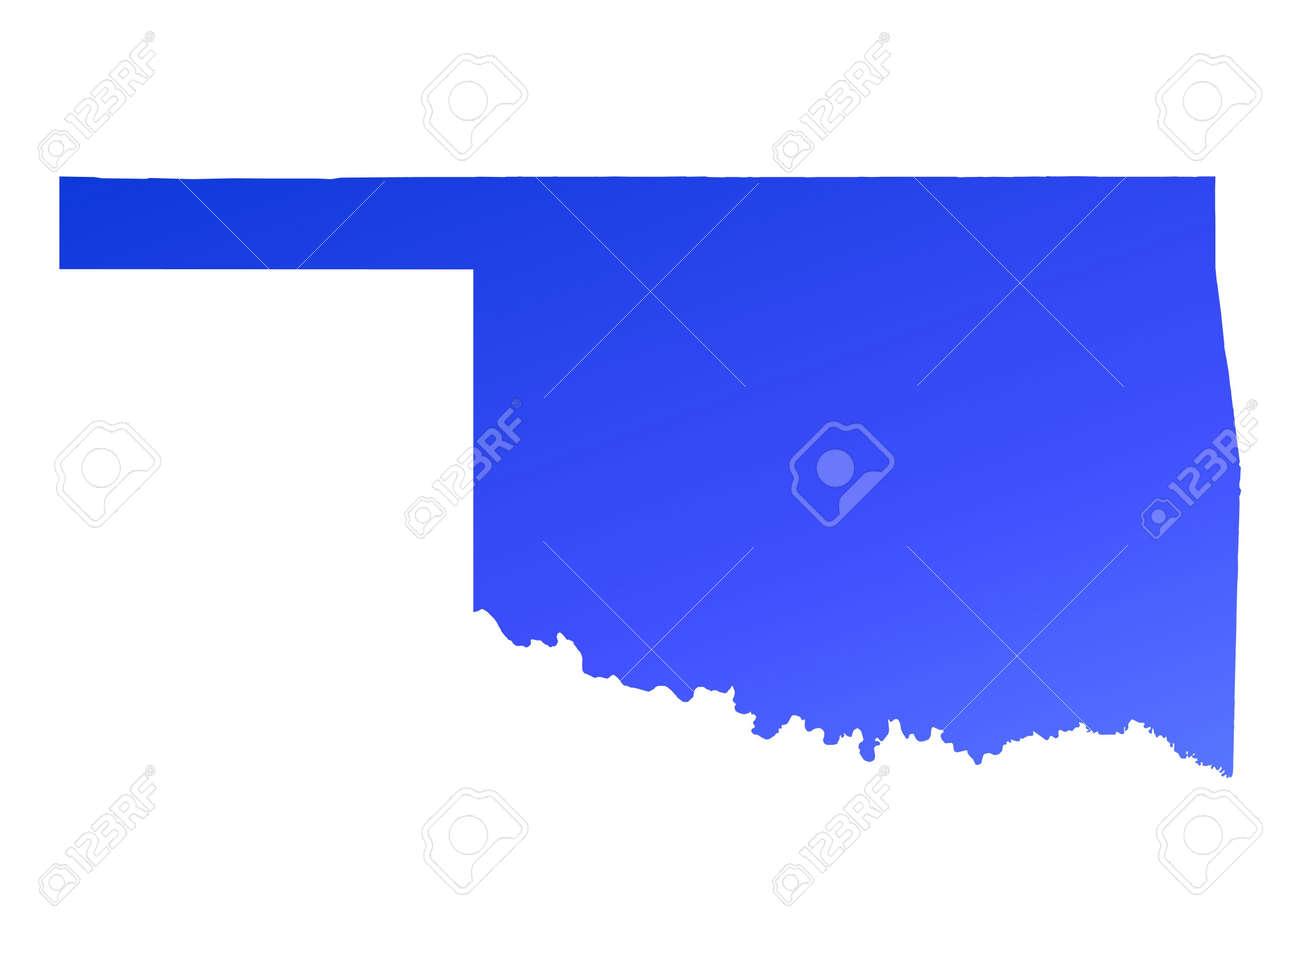 blue gradient oklahoma map usa detailed mercator projection stock photo 2119109